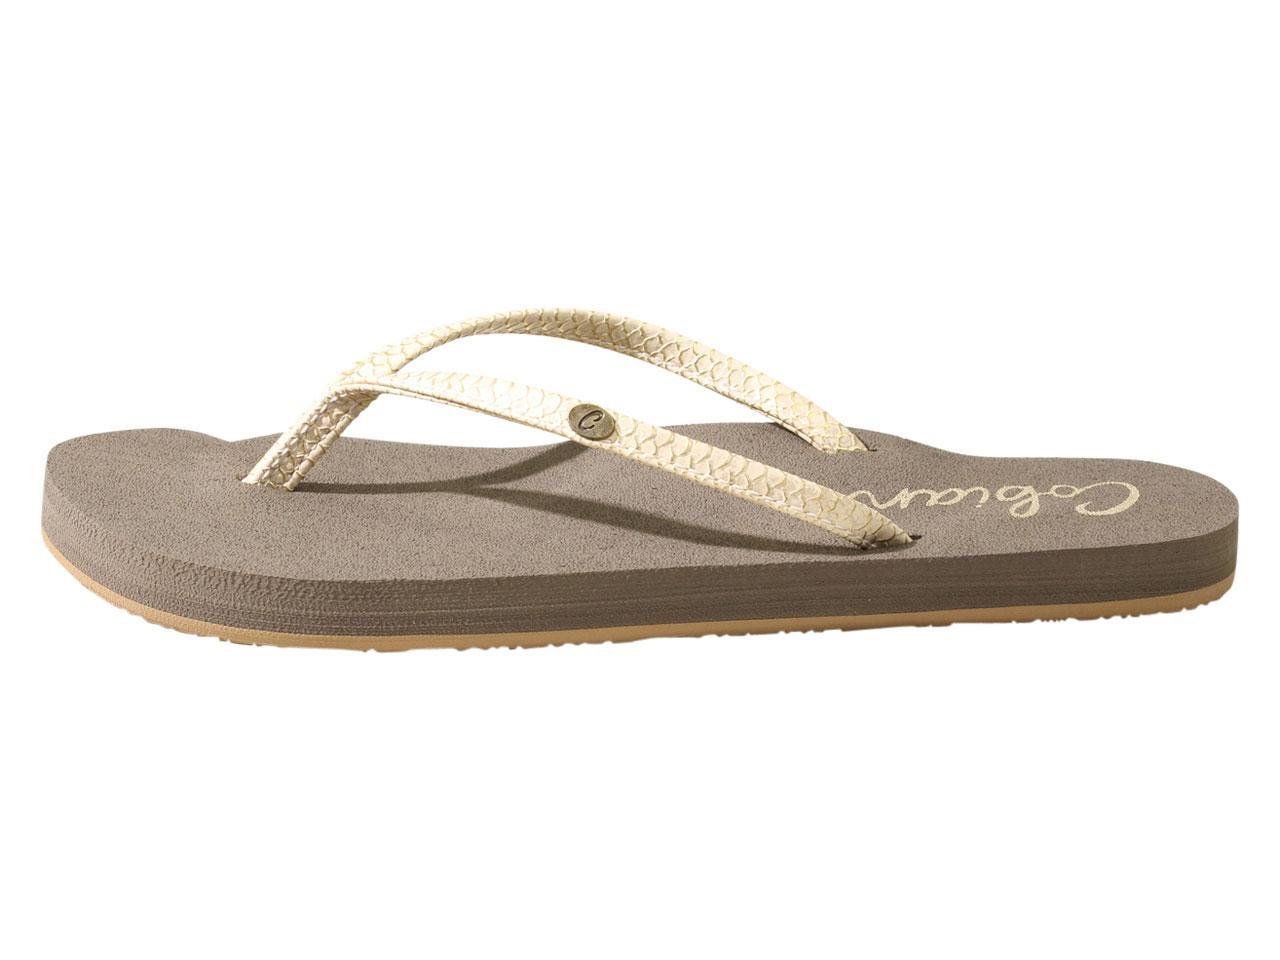 ddd7fd3cfa4ac Cobian Women s Nias Bounce Flip Flops Sandals Shoes